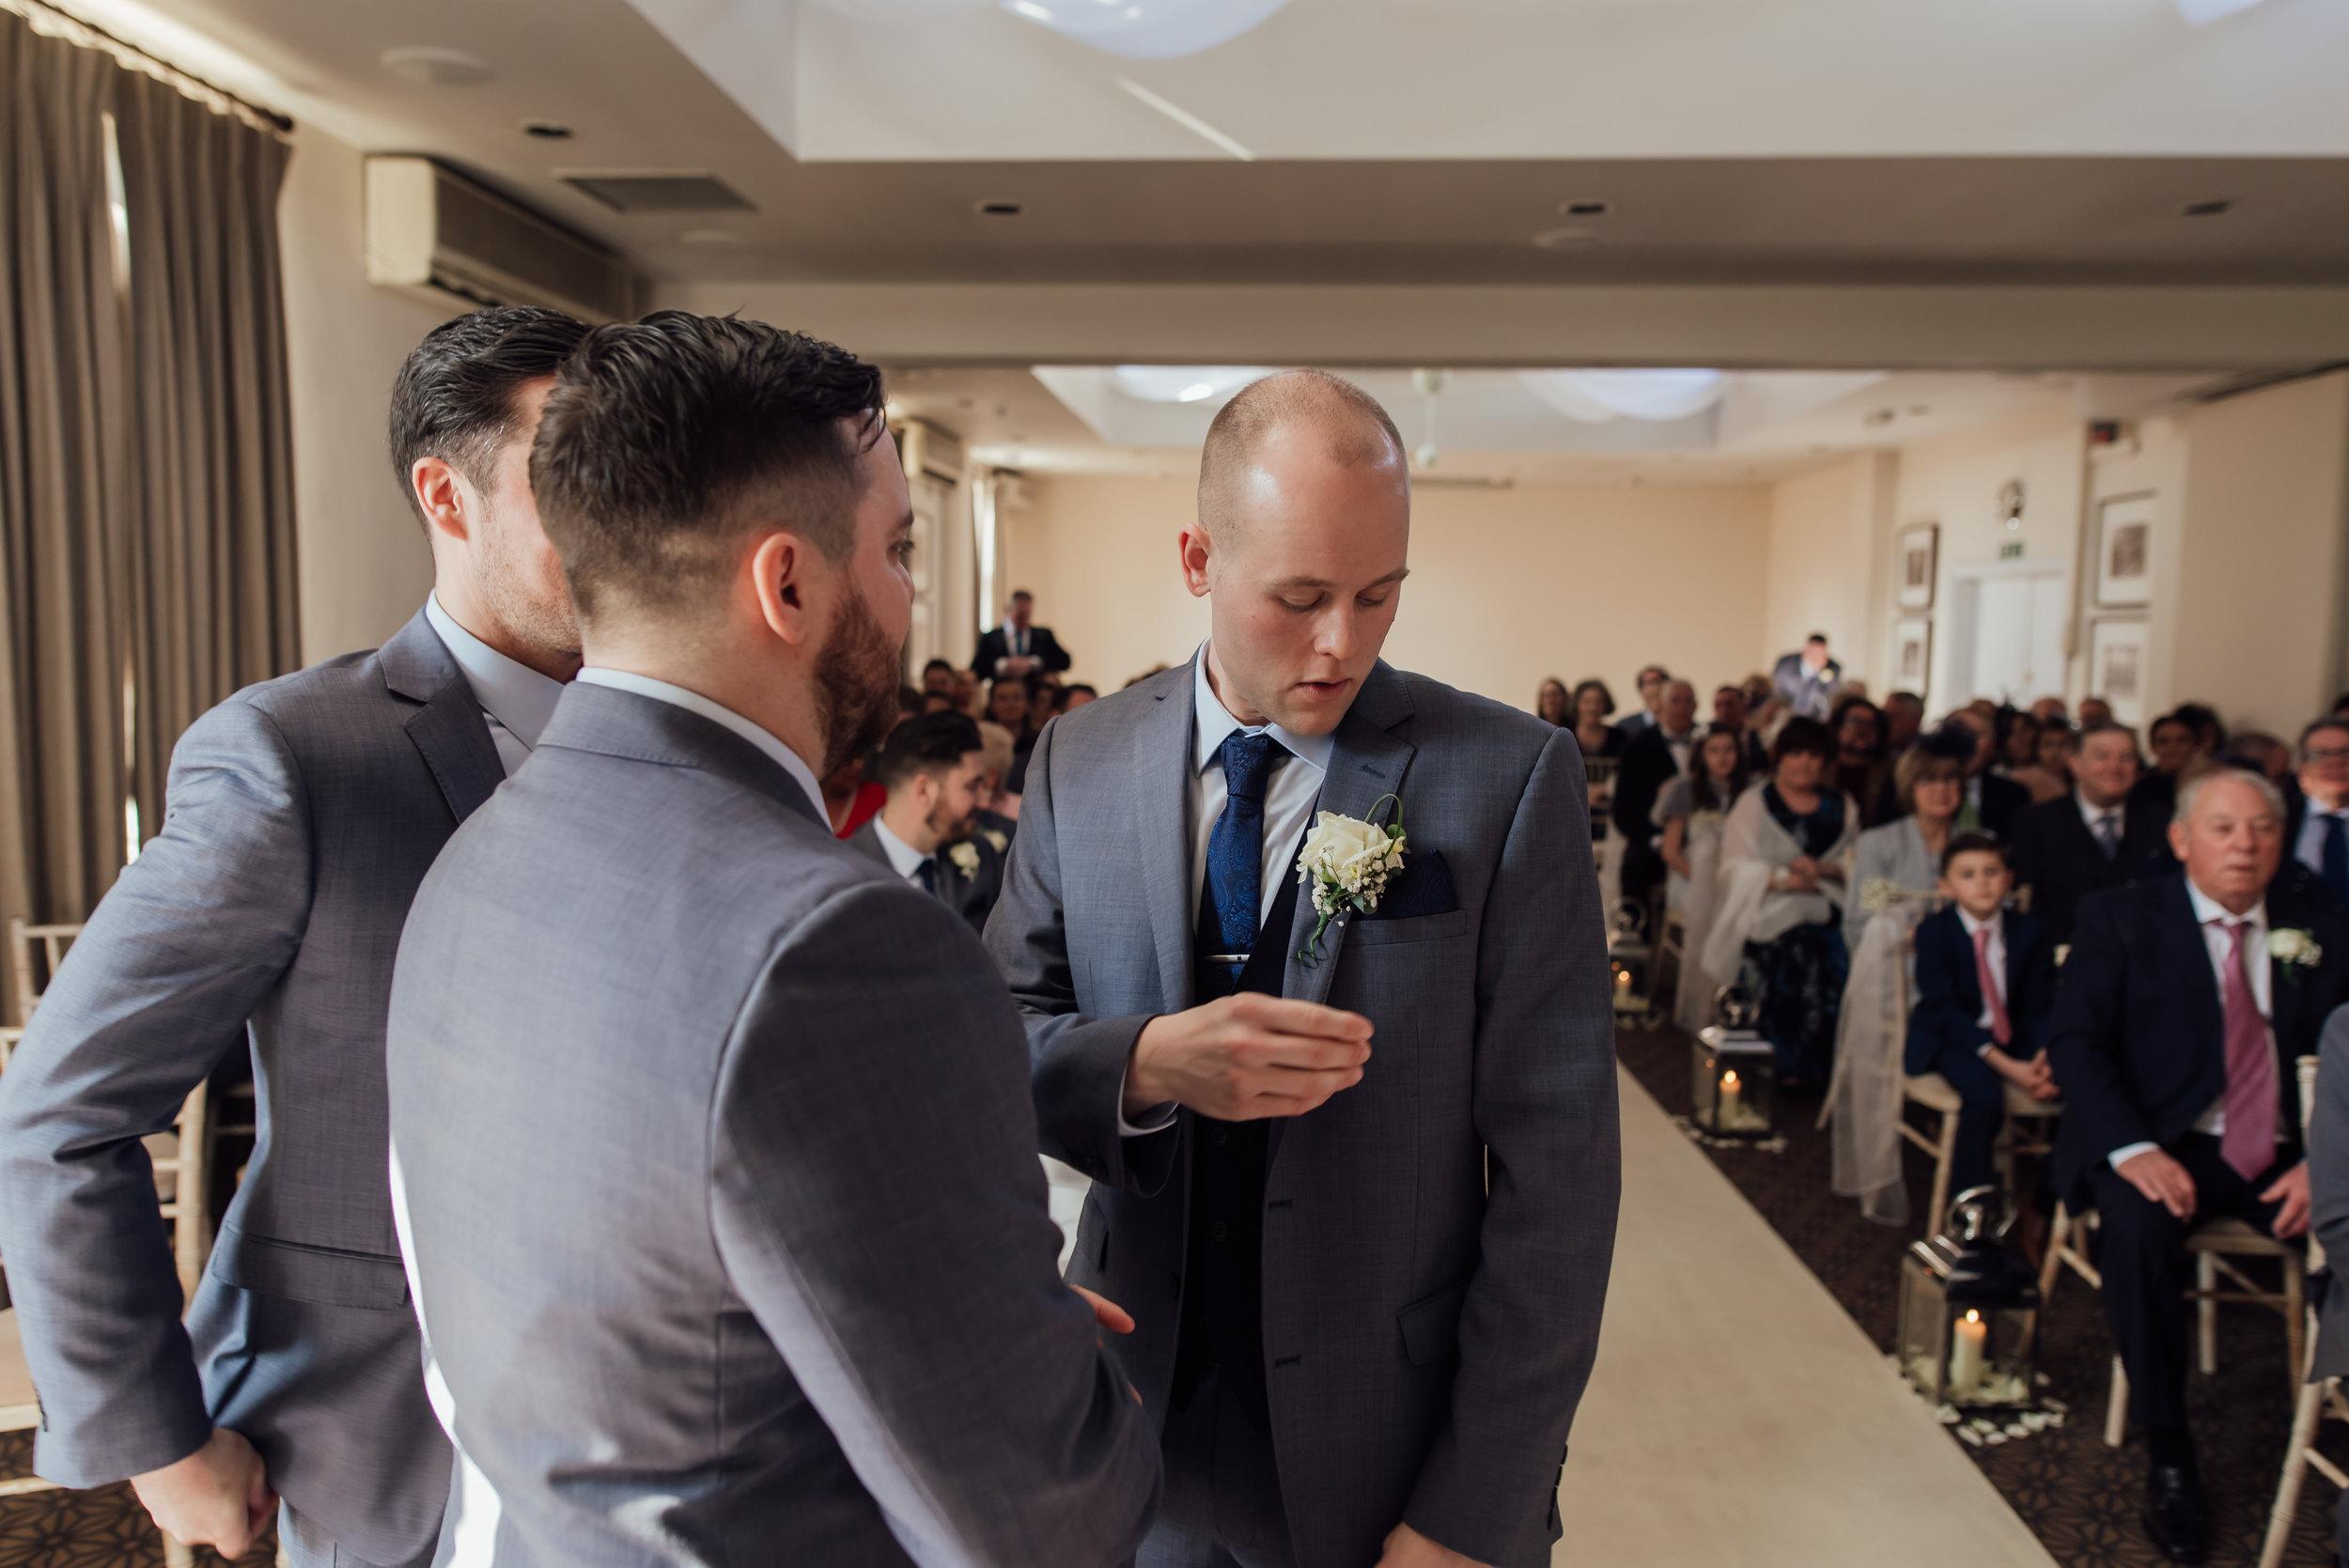 Sarah-Fishlock-Photography-Hampshire-wedding-photographer : fleet-wedding-photographer-fleet : warbrook-house-wedding-venue : warbrook-house-wedding-photographer : hampshire-wedding-venue